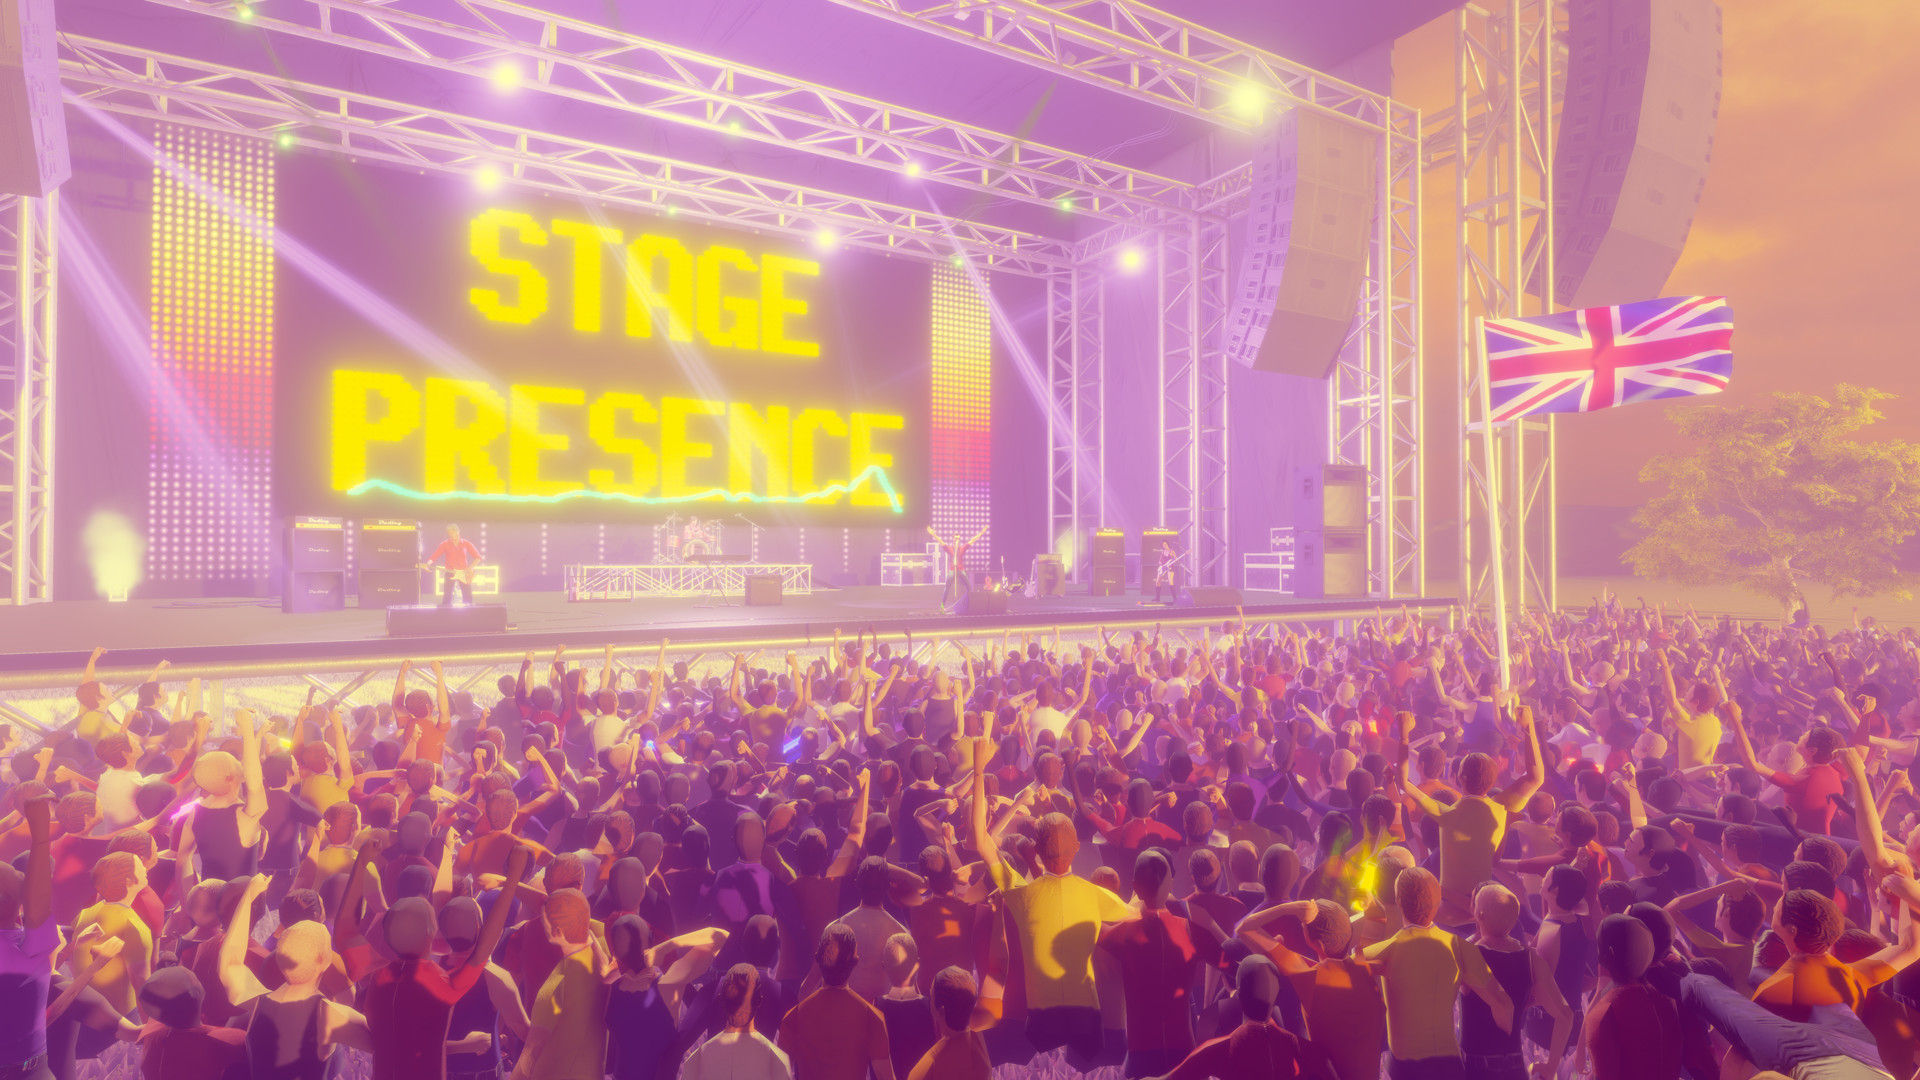 Stage Presence Setup Free Download